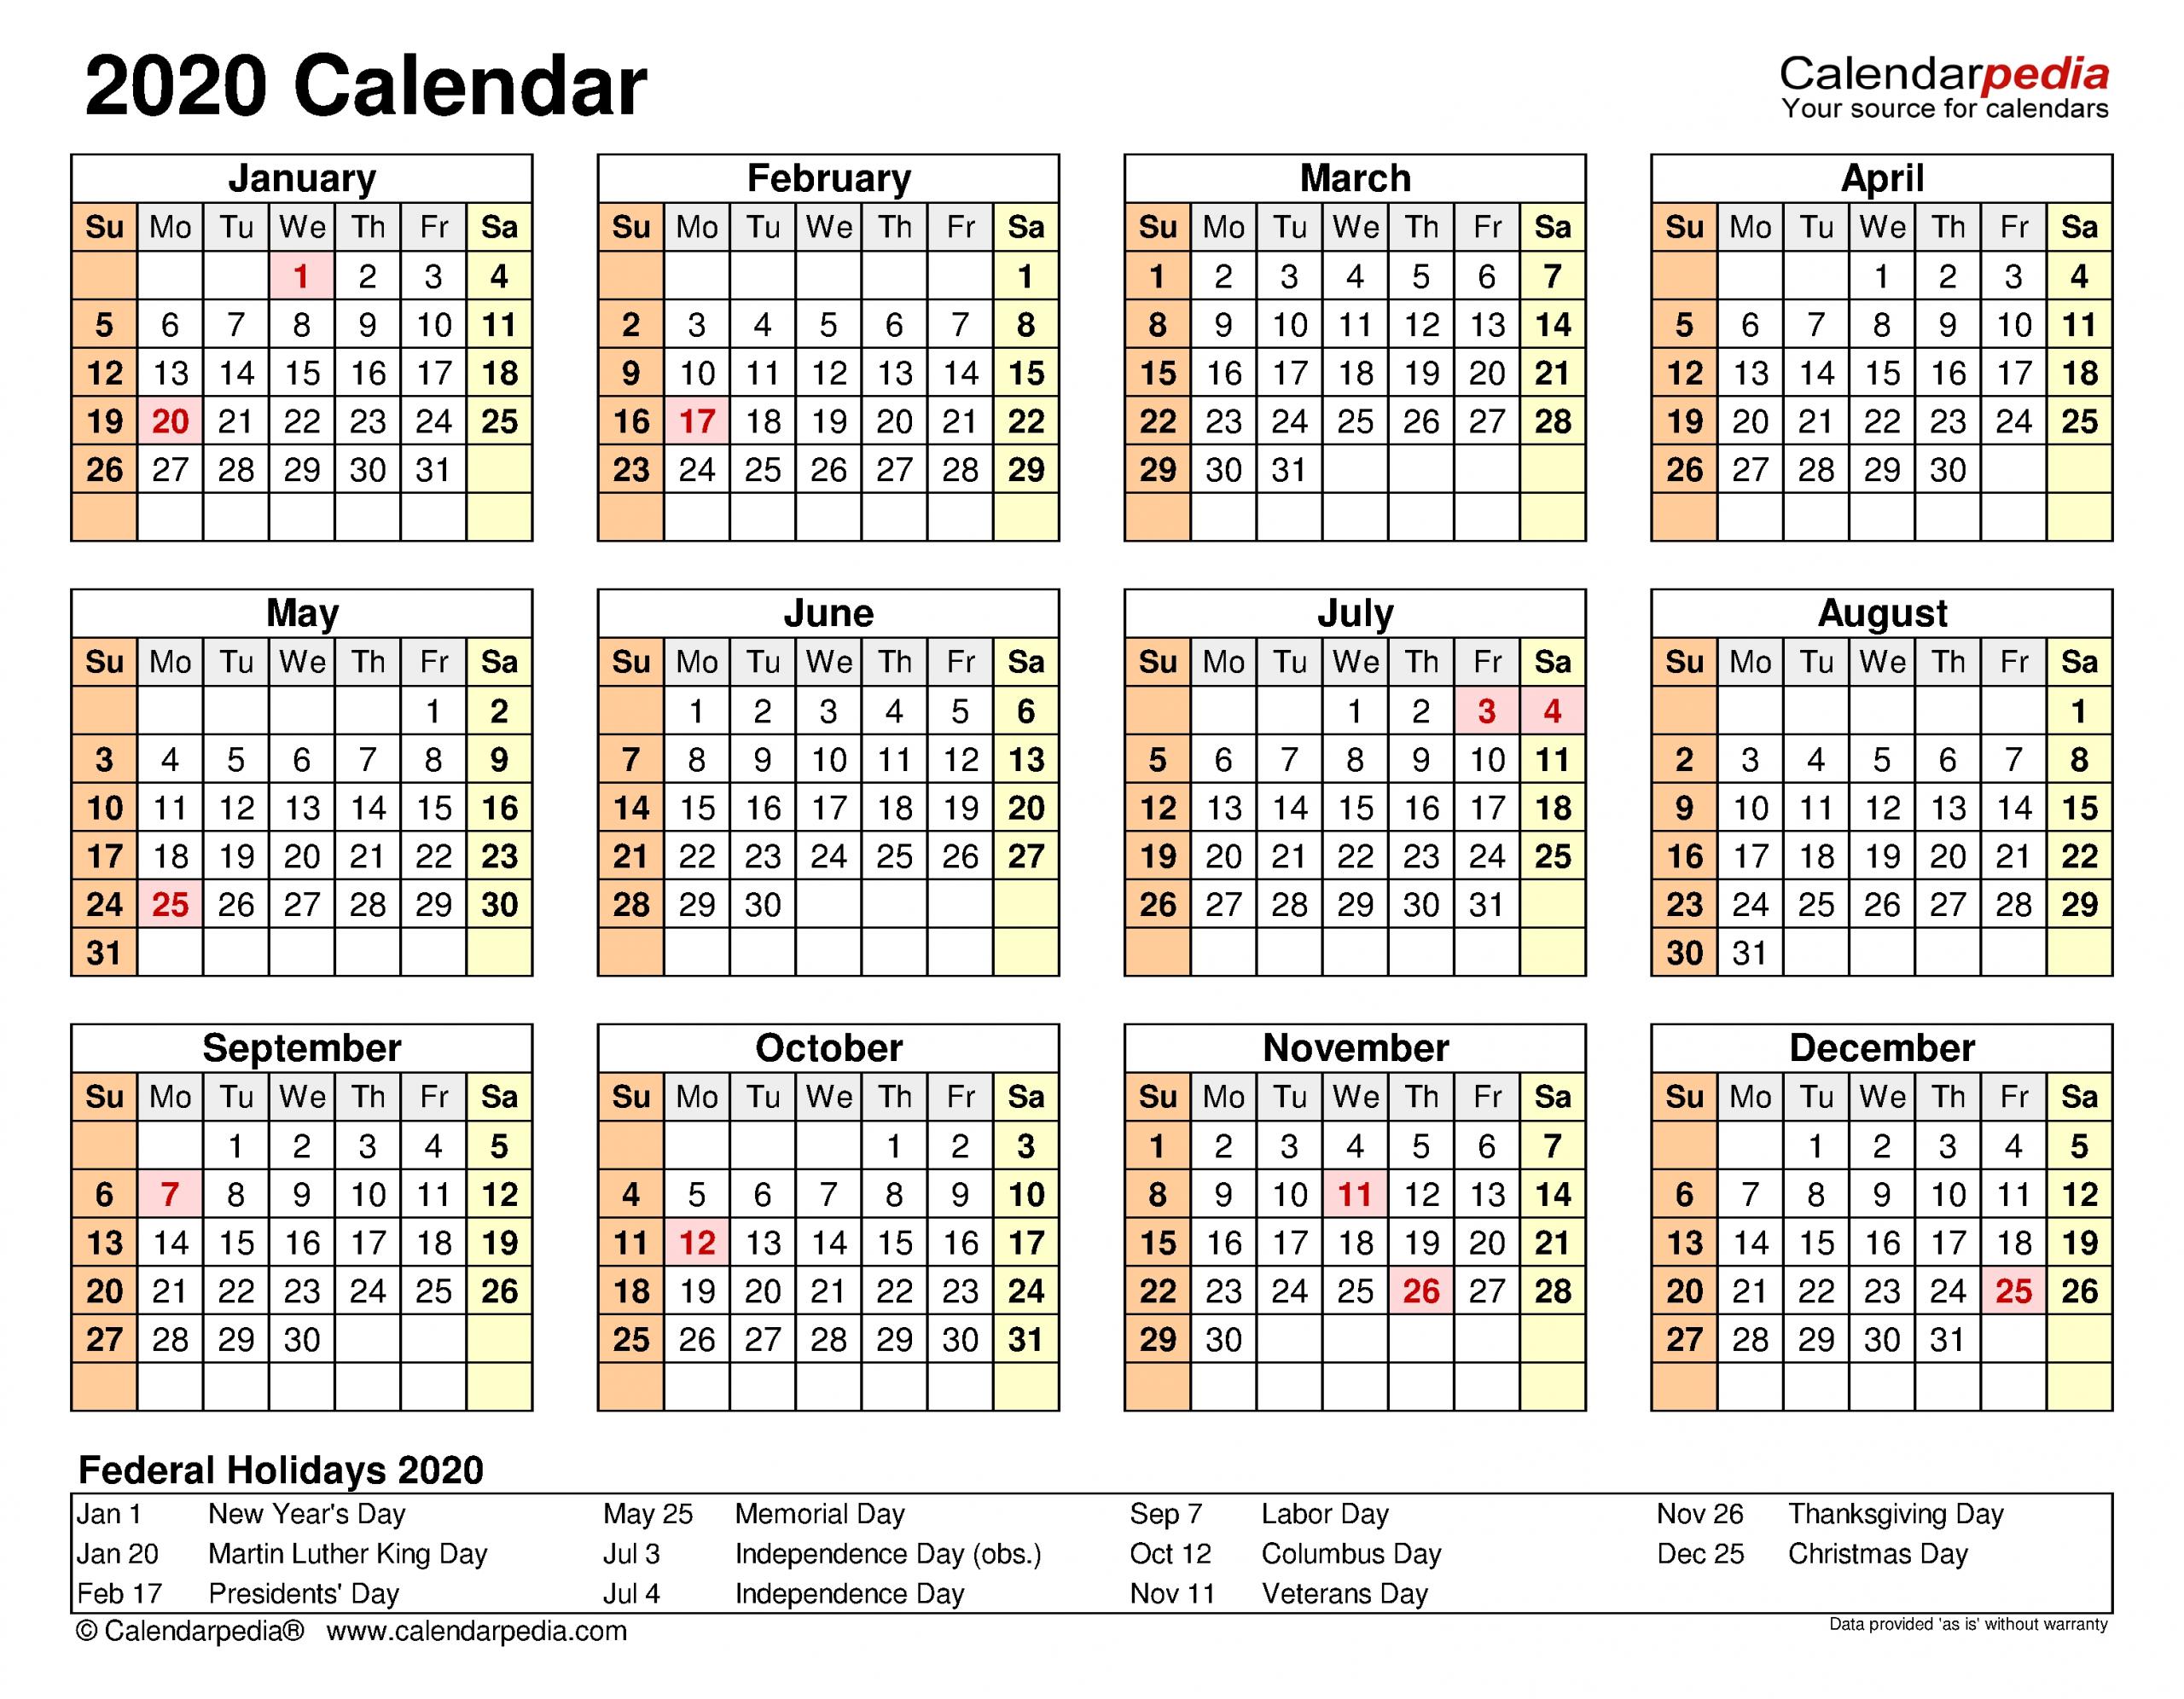 2020 Calendar - Free Printable Word Templates - Calendarpedia with Calendar 2020 Week Wise In Window